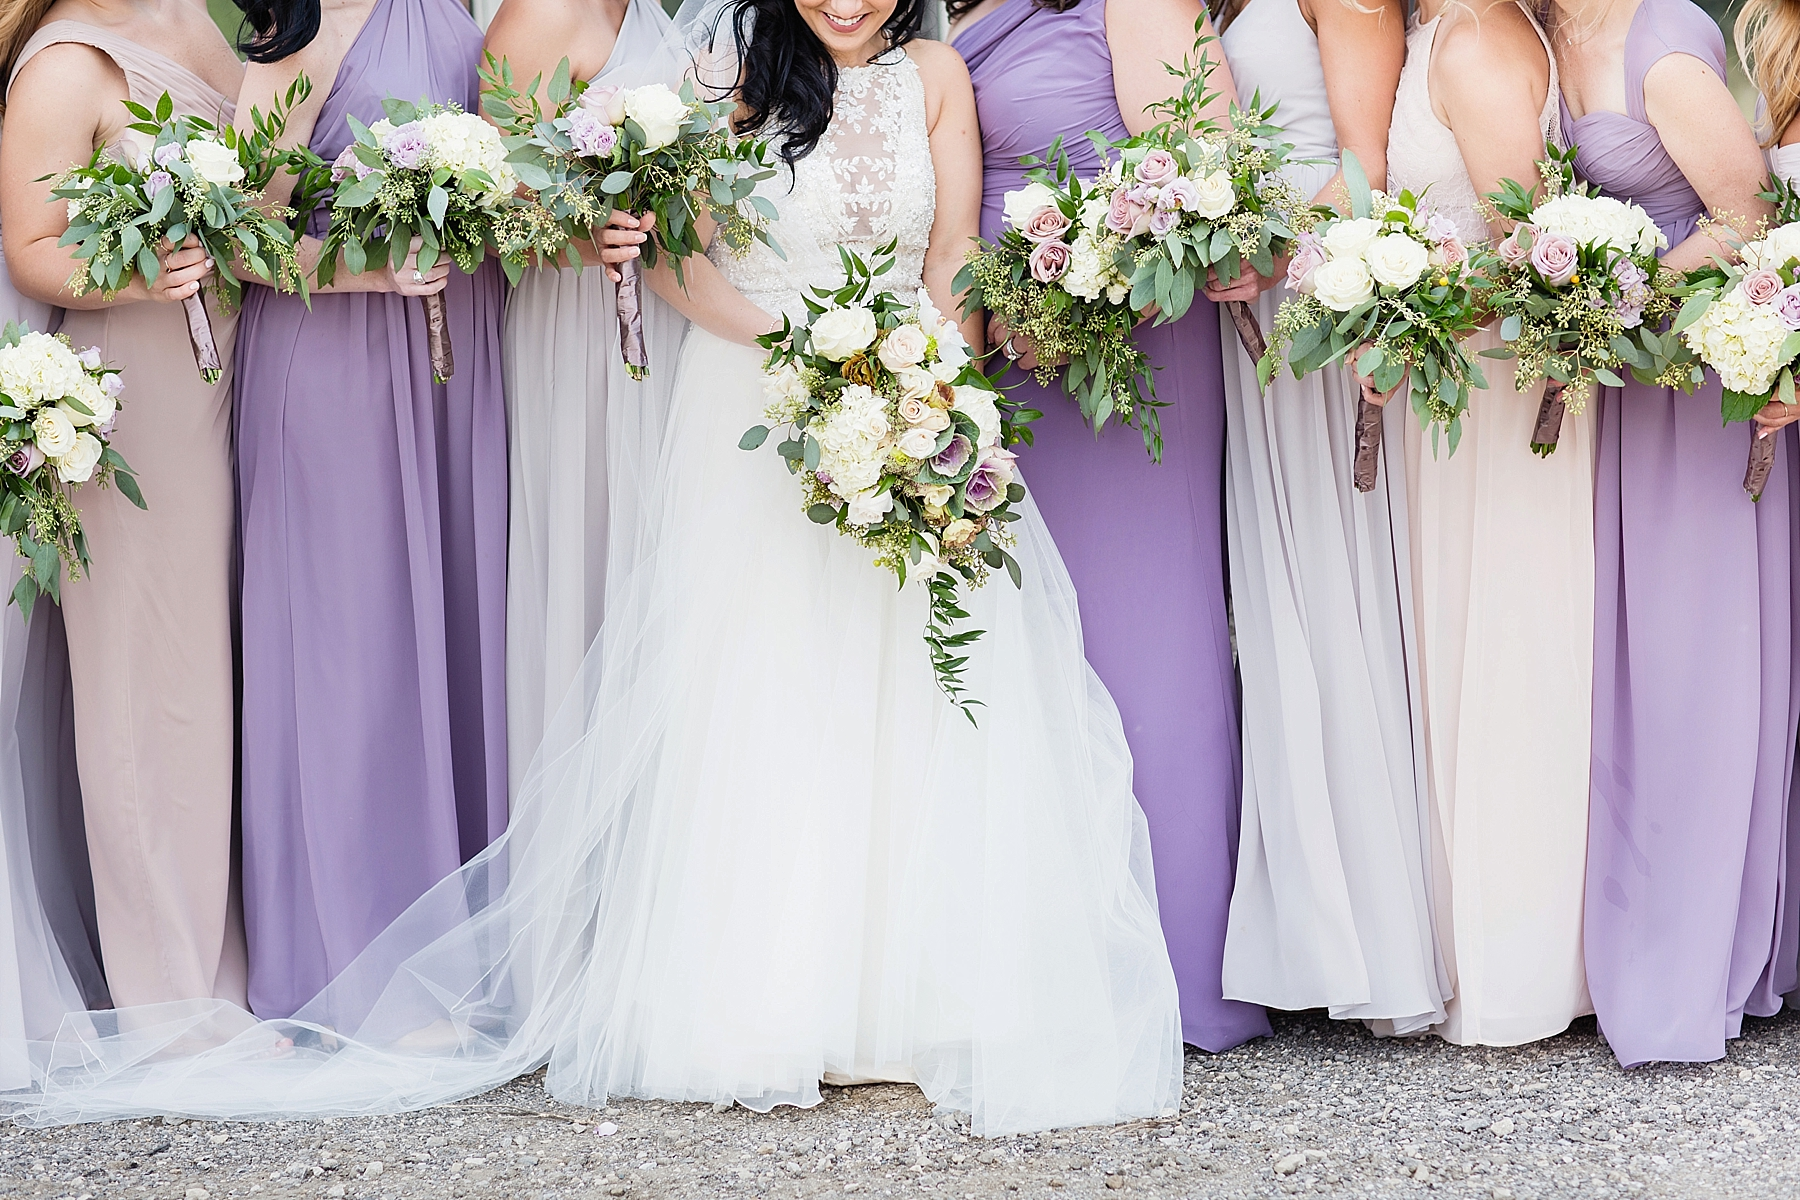 windsor-wedding-photographer-sprucewood-shores-winery-wedding-niagara-on-the-lake-wedding-photographer-eryn-shea-photography_0026.jpg